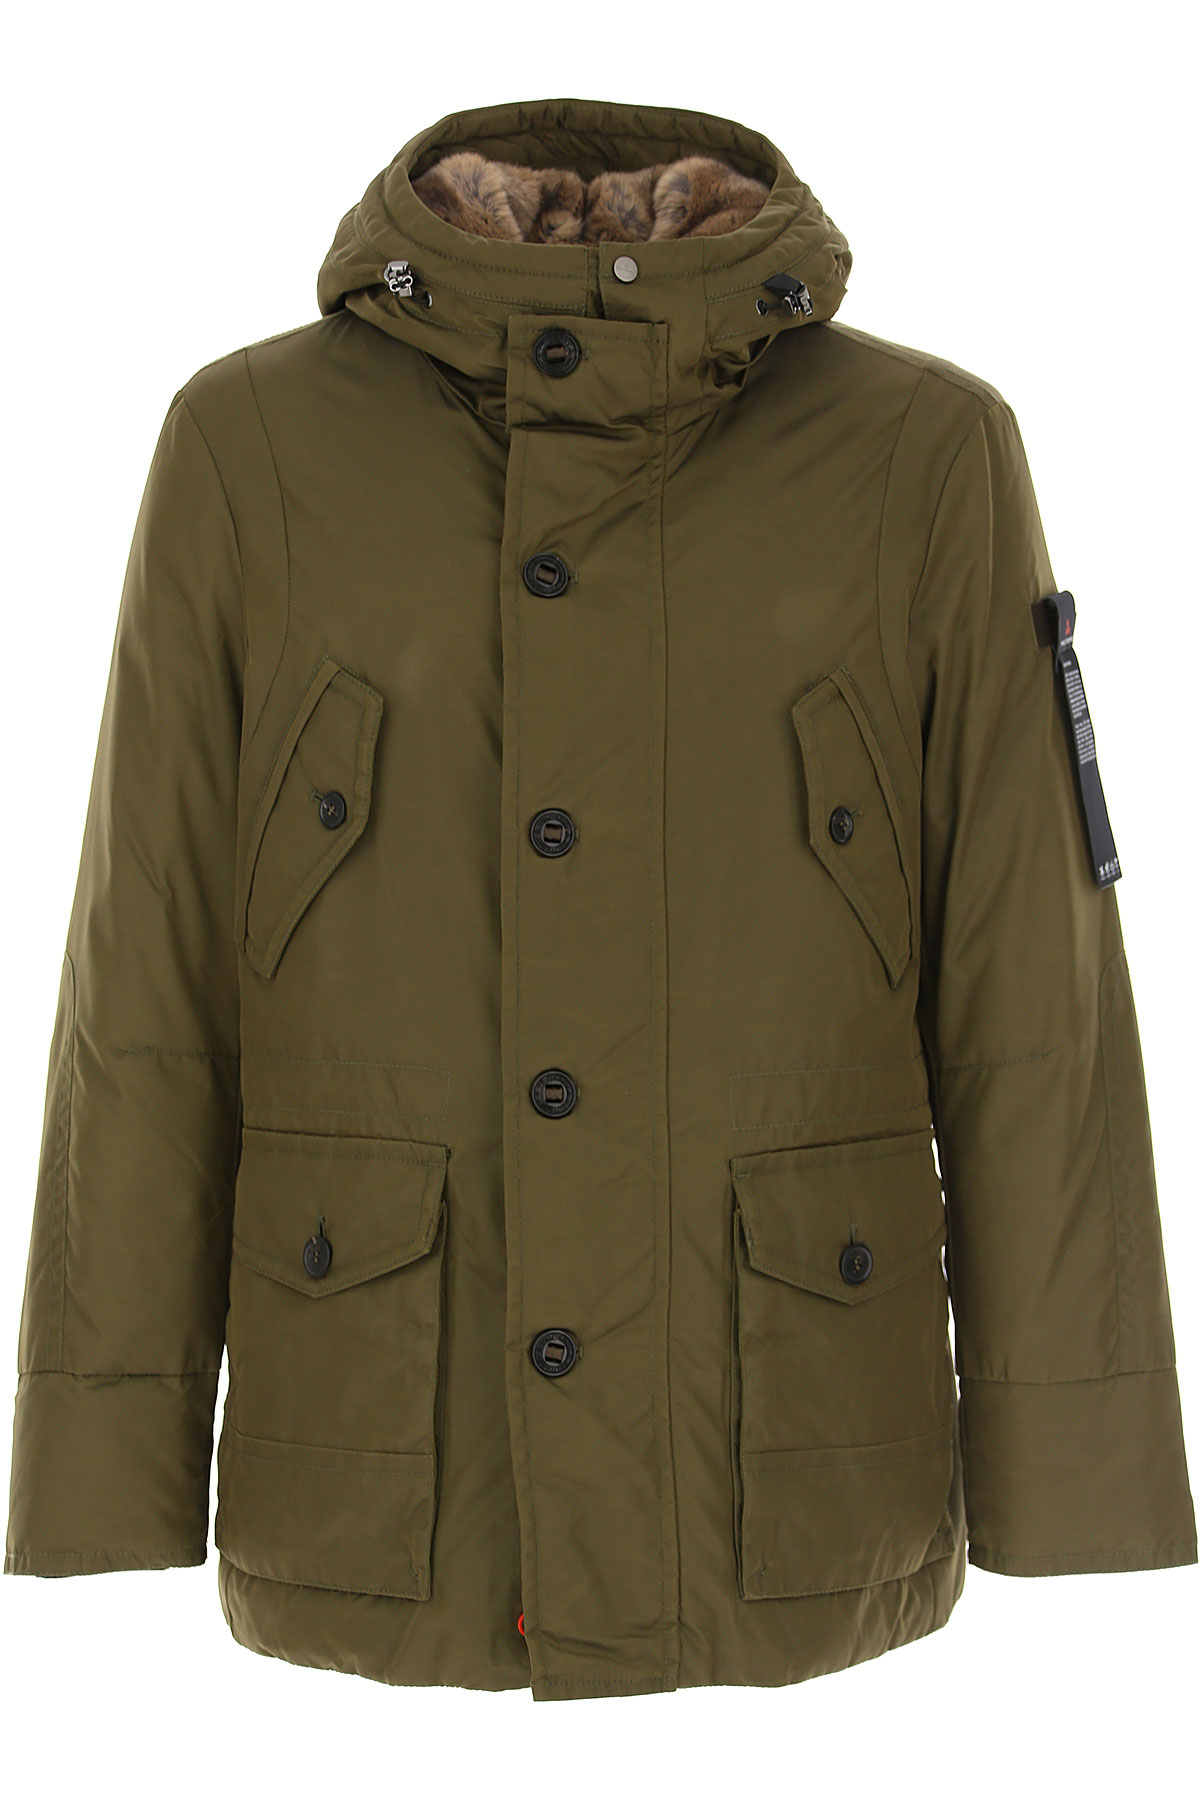 Peuterey Down Jacket for Men, Puffer Ski Jacket On Sale, Military Green, Down, 2019, L M XL XXL